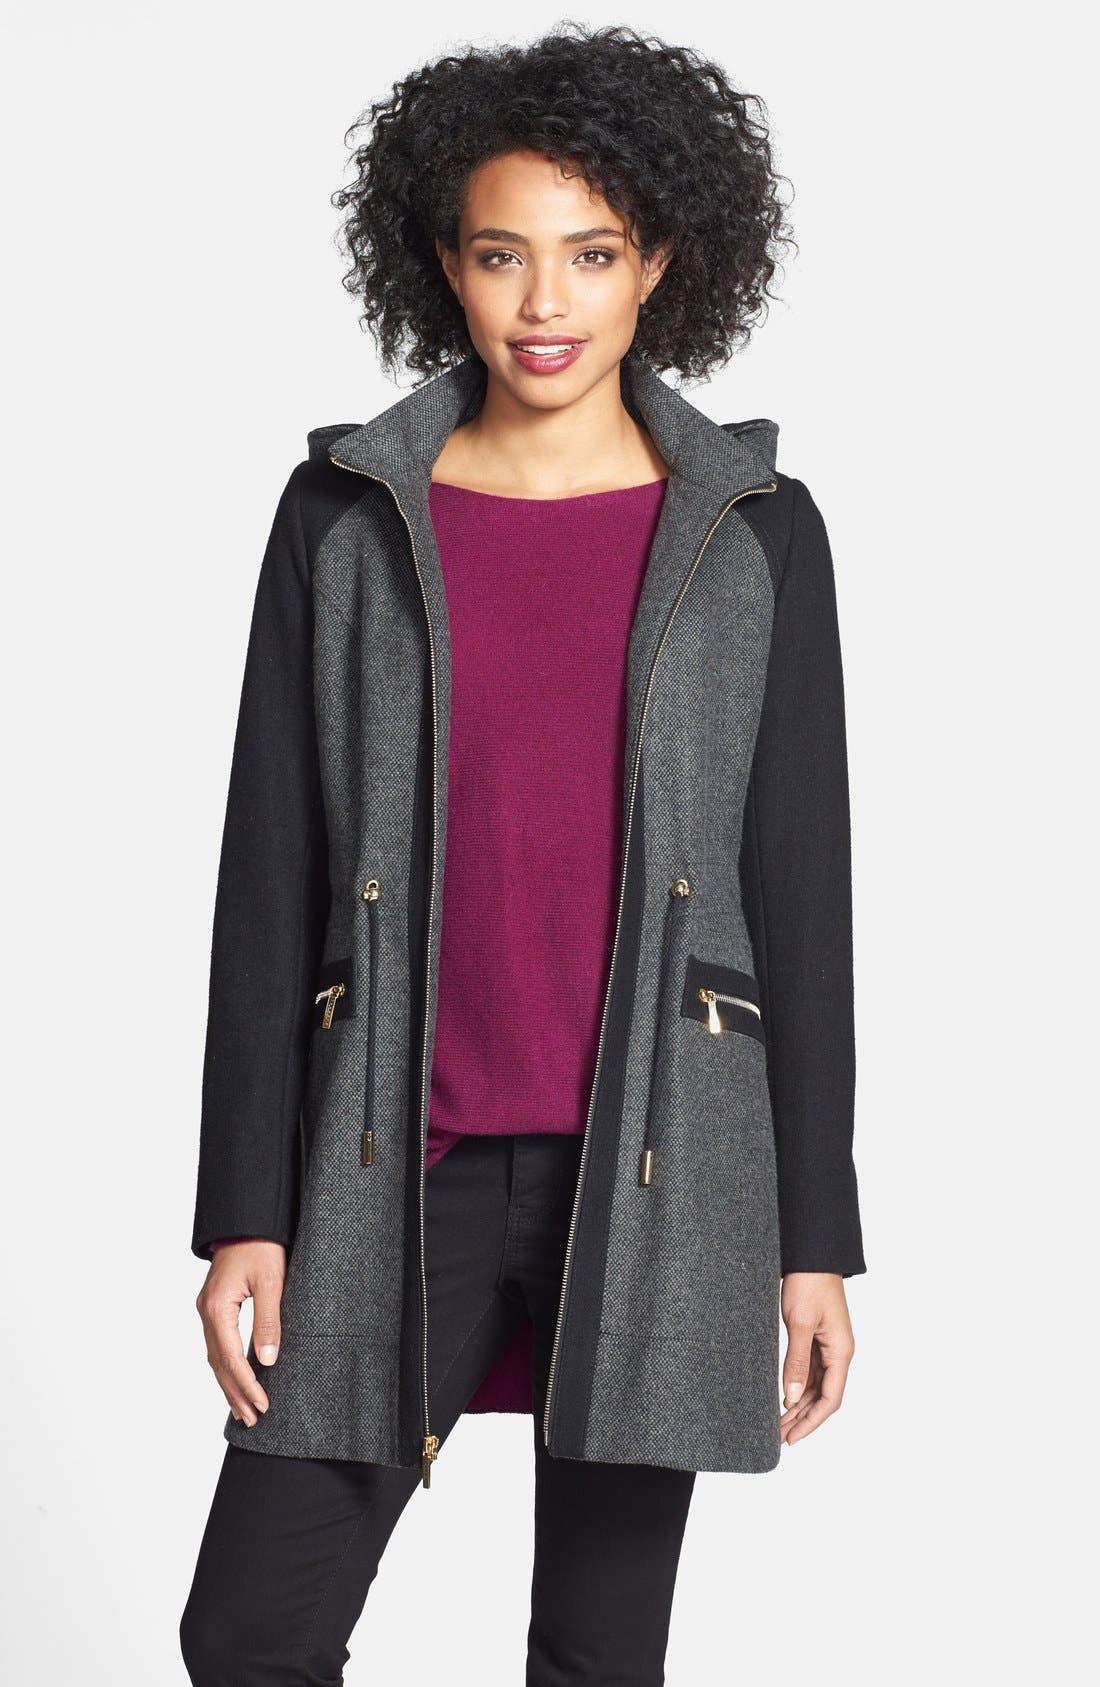 Alternate Image 1 Selected - Laundry by Shelli Segal Faux Fur Trim Colorblock Tweed Coat